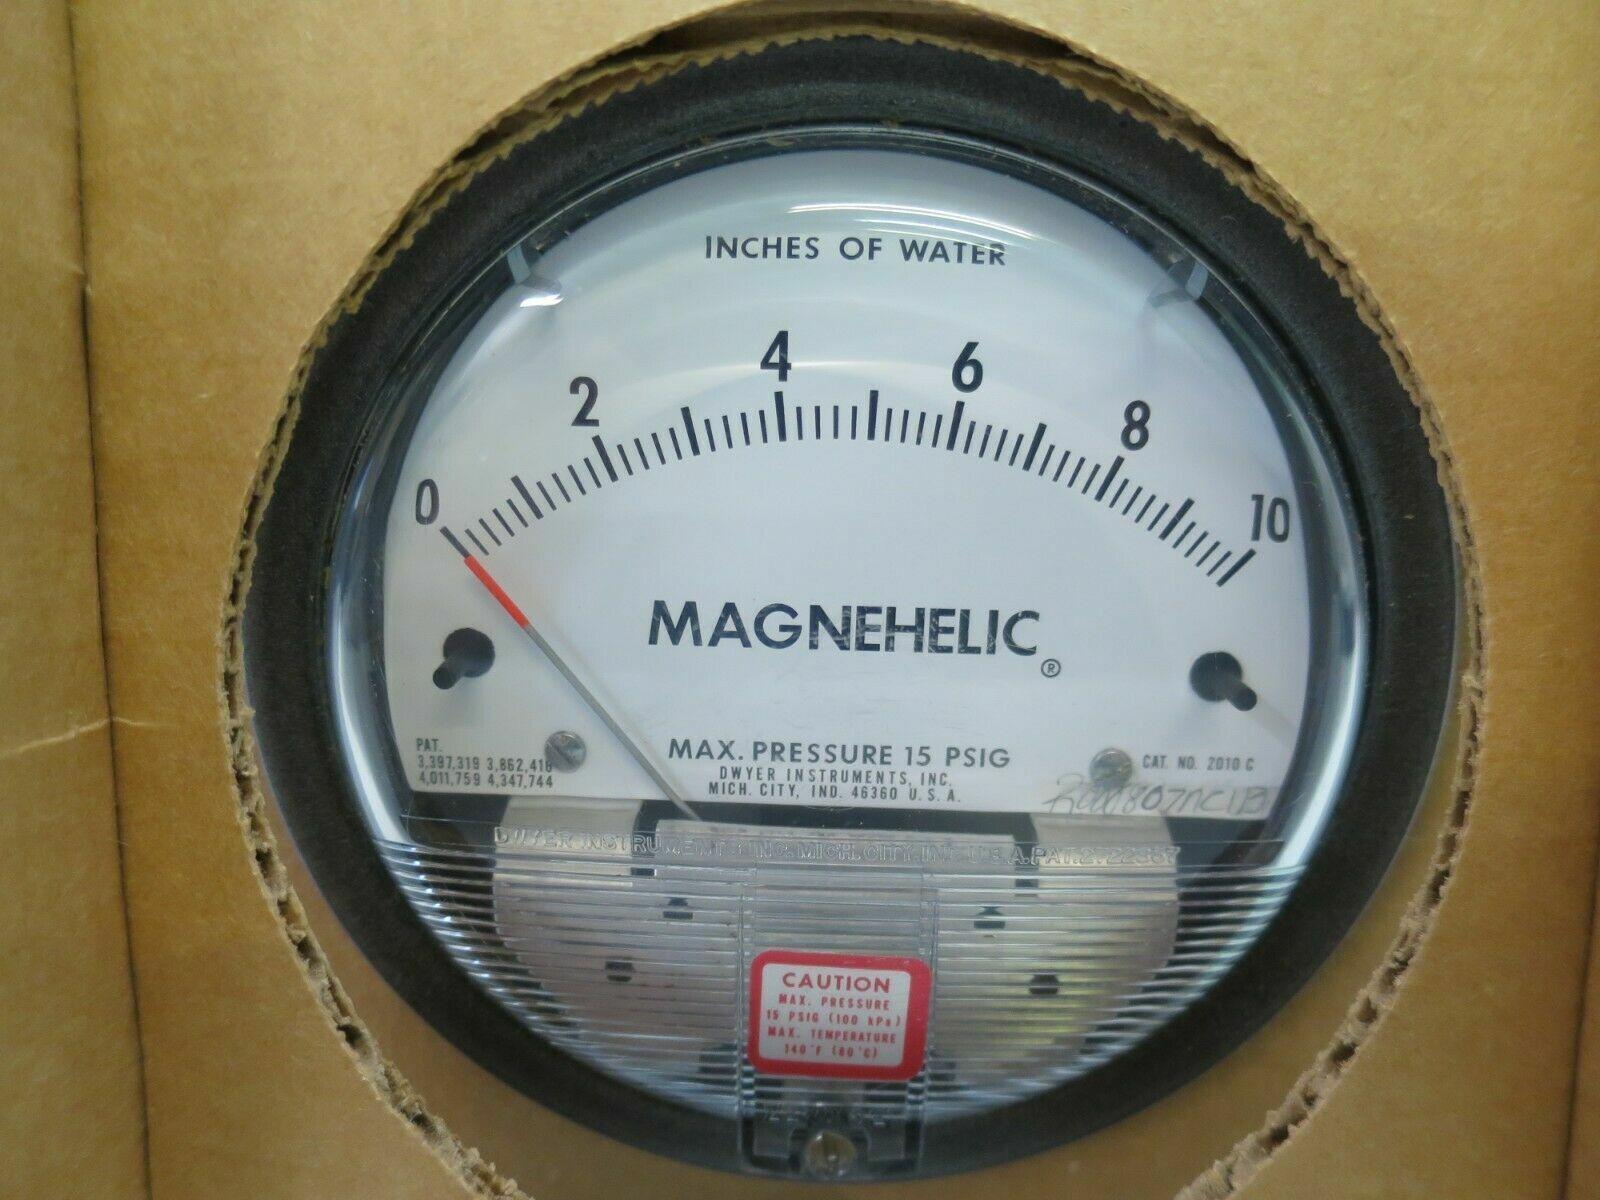 Dwyer Capsuhelic Series 4000 Differential Pressure Gauge Range 0-4WC Range 0-4WC Dwyer Instruments 4004